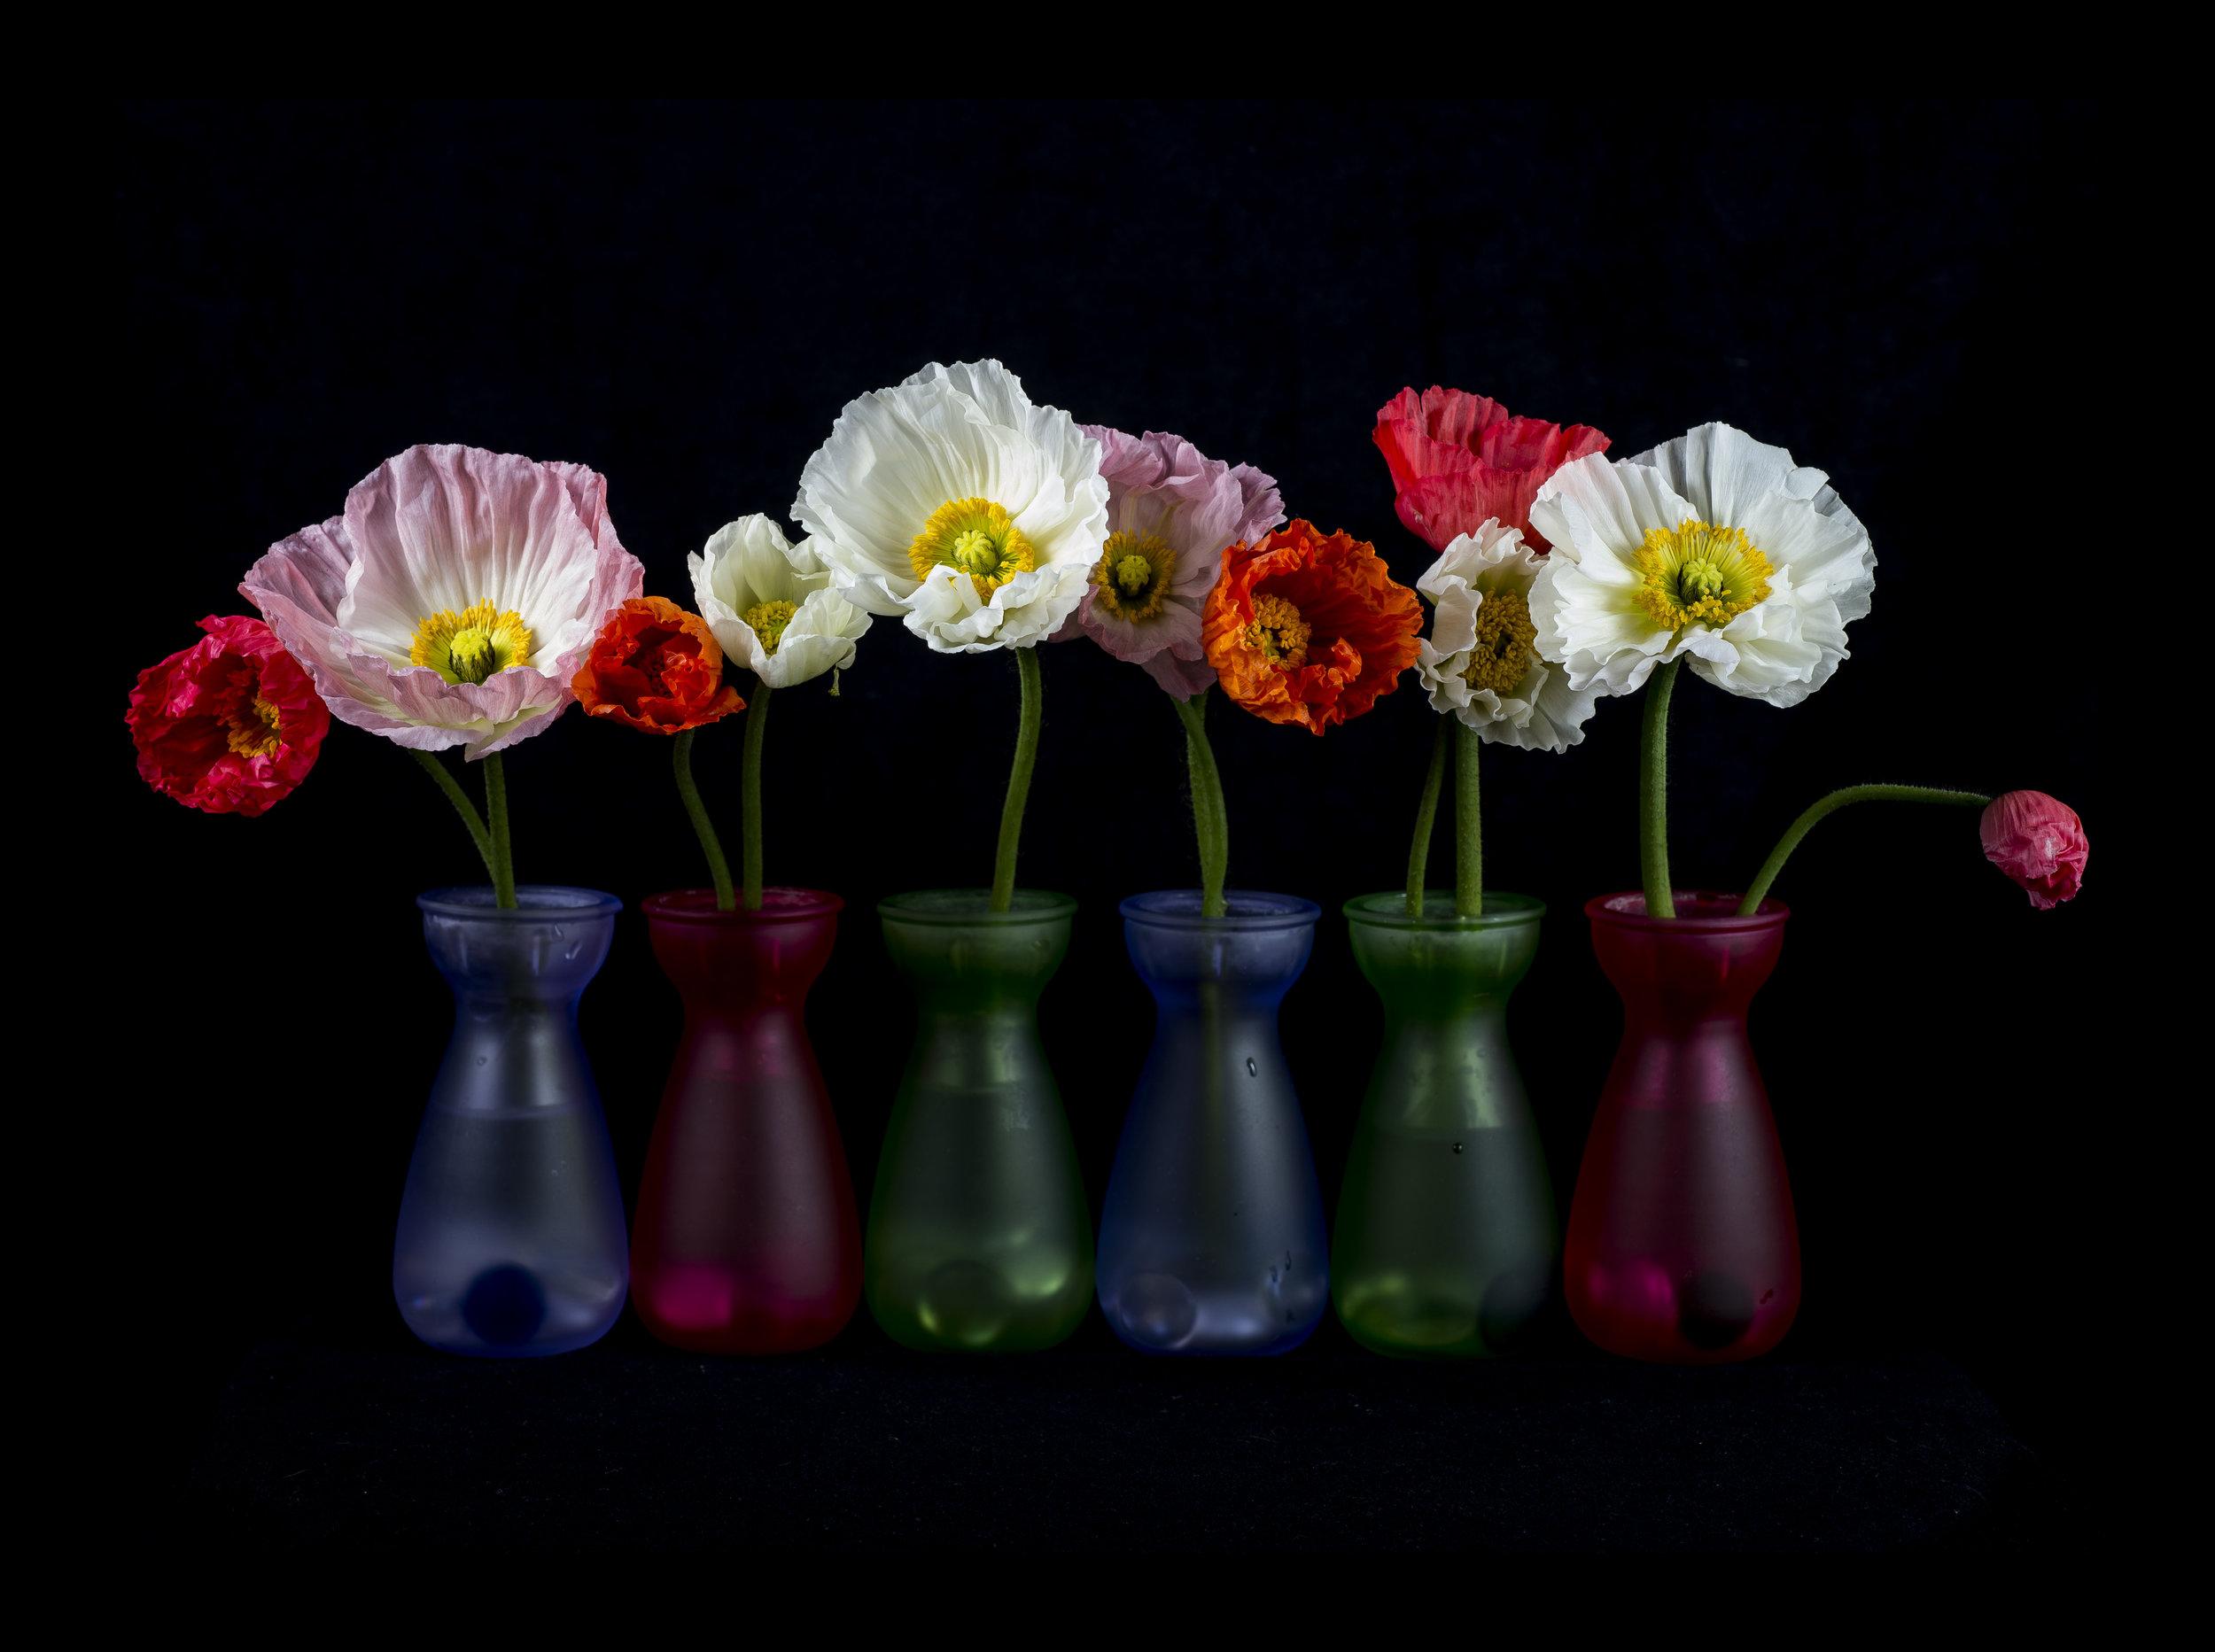 Durham_D4sFLASHTest_FlowerStudy11x15_292015.jpg